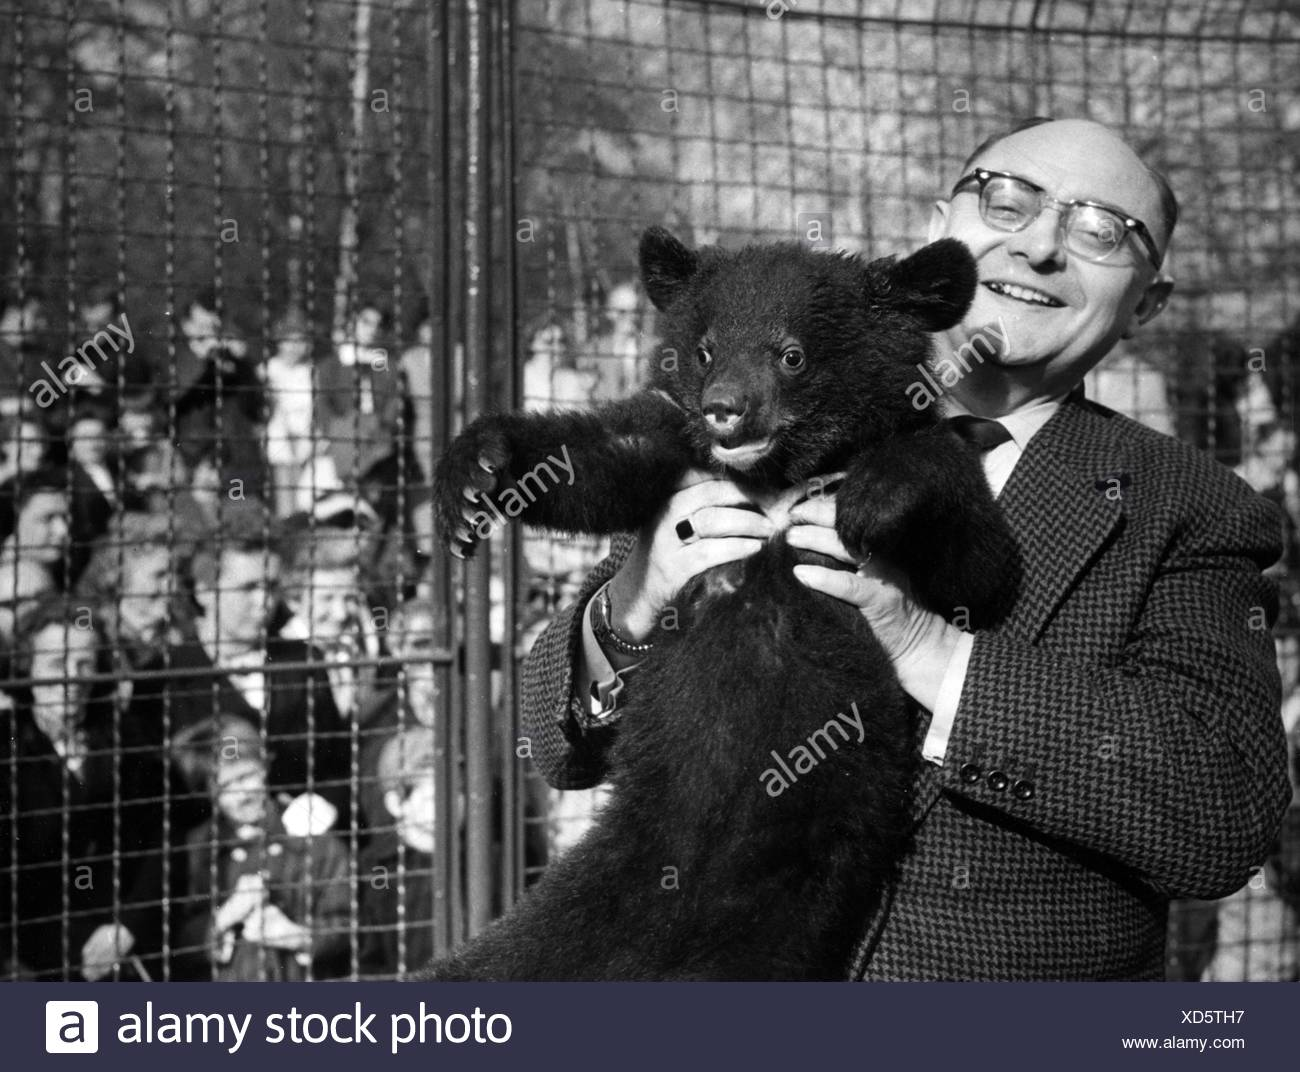 Dathe, Heinrich, 7.11.1910 - 6.1.1991, German zoologist, director of the zoo in Berlin Friedrichsfelde 1954 - 1990, half length, Stockbild